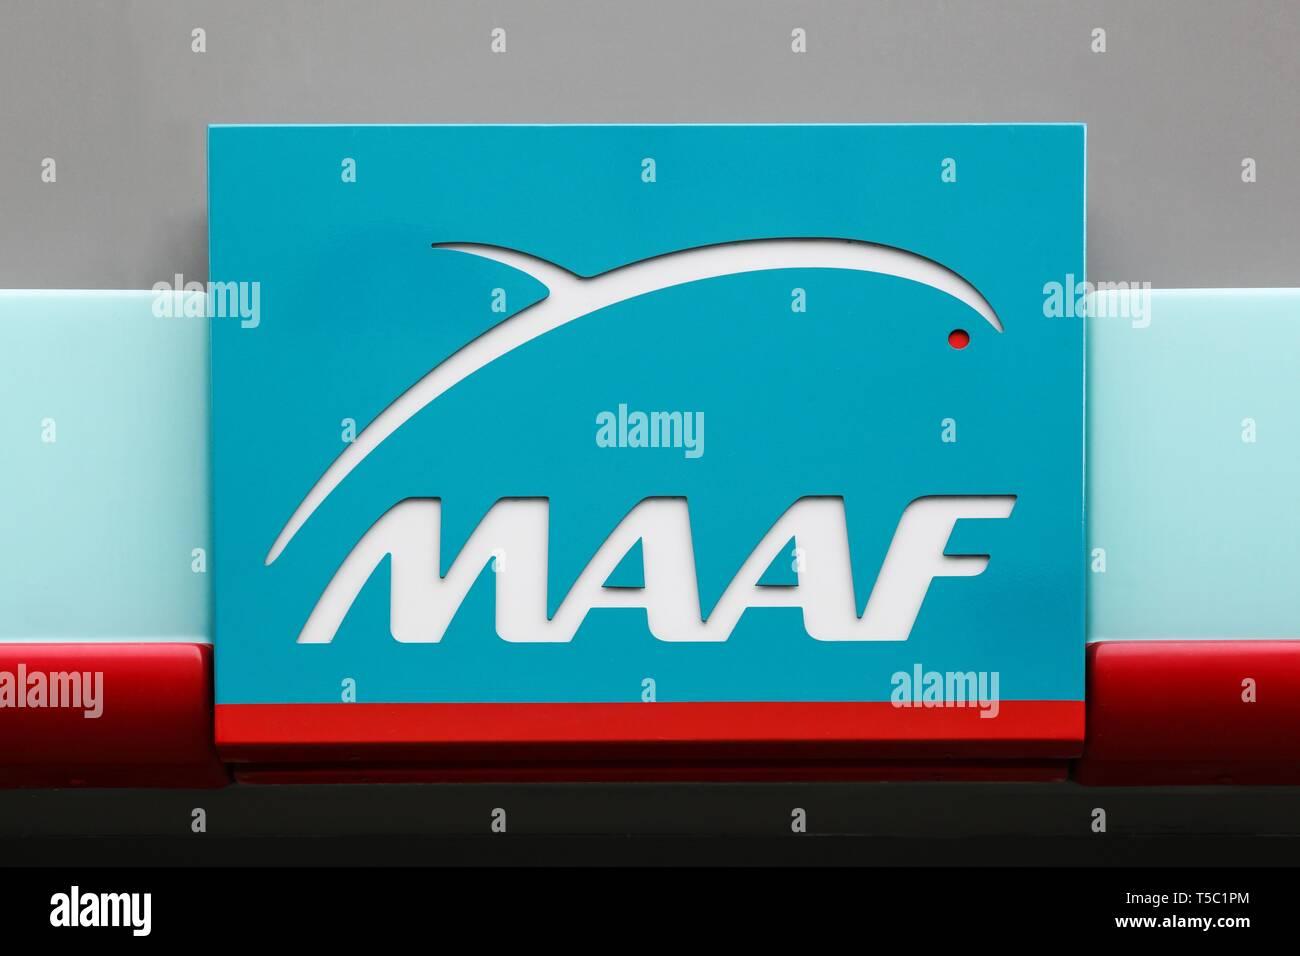 Bourg, France - Avril 7, 2019: MAAF assurances logo on a wall. MAAF Assurances is a French mutual insurance company - Stock Image